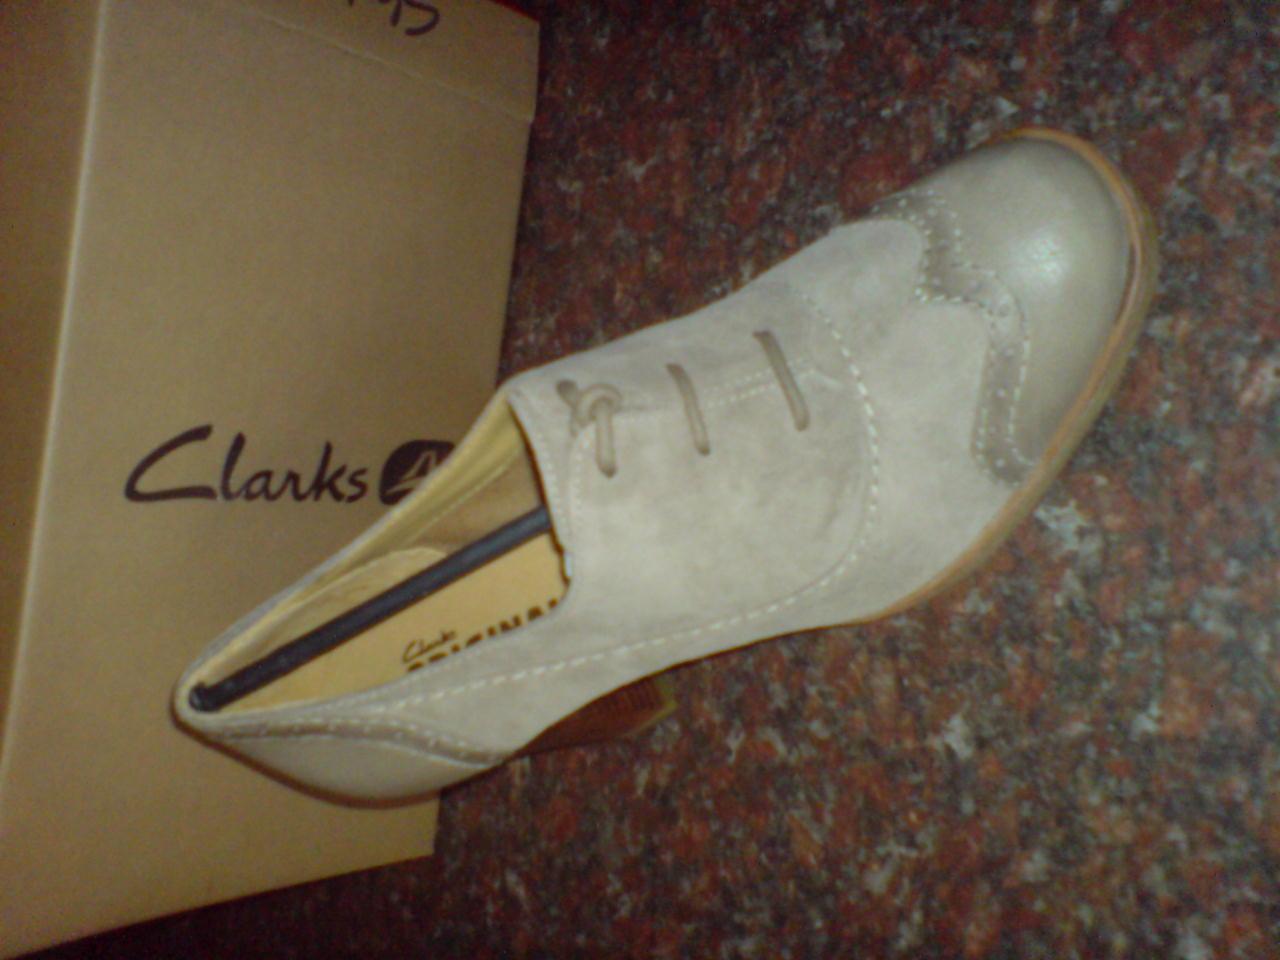 Clarks Originals Damenschuhe  Combi KITZI FUN  SAND Combi  Suede  UK 8 / 7.5 78c2ab